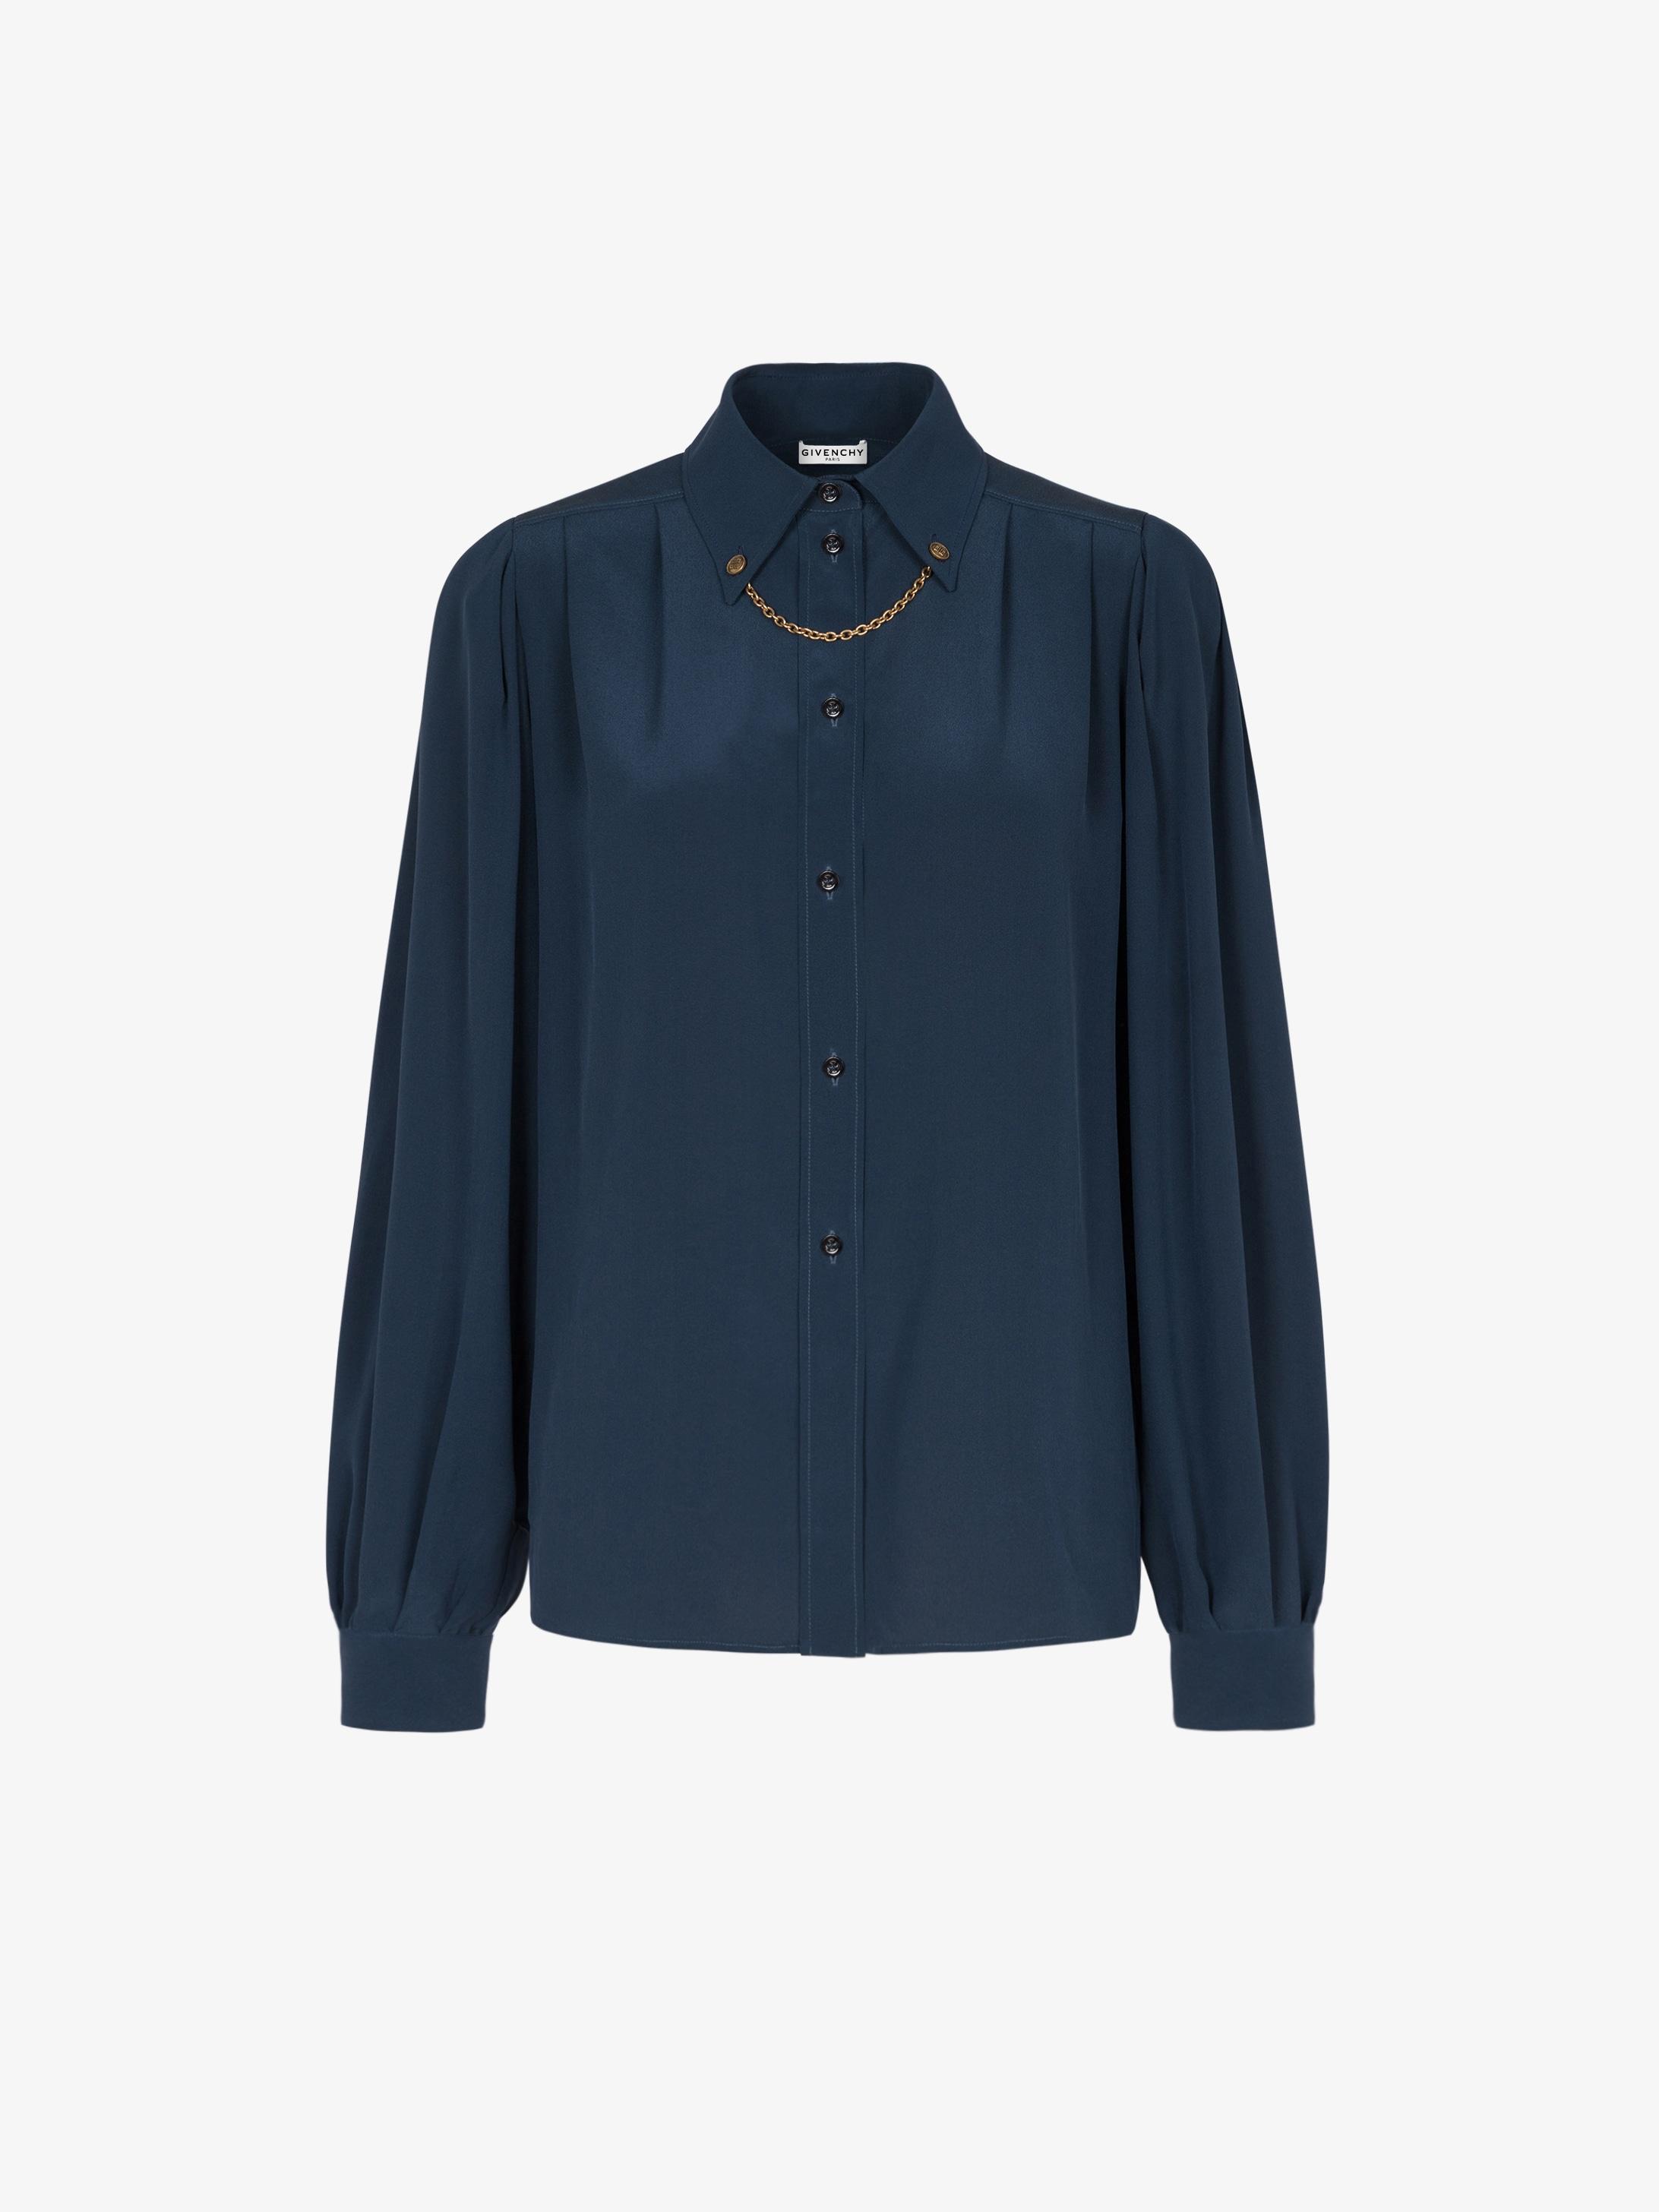 Shirt in silk with chain collar